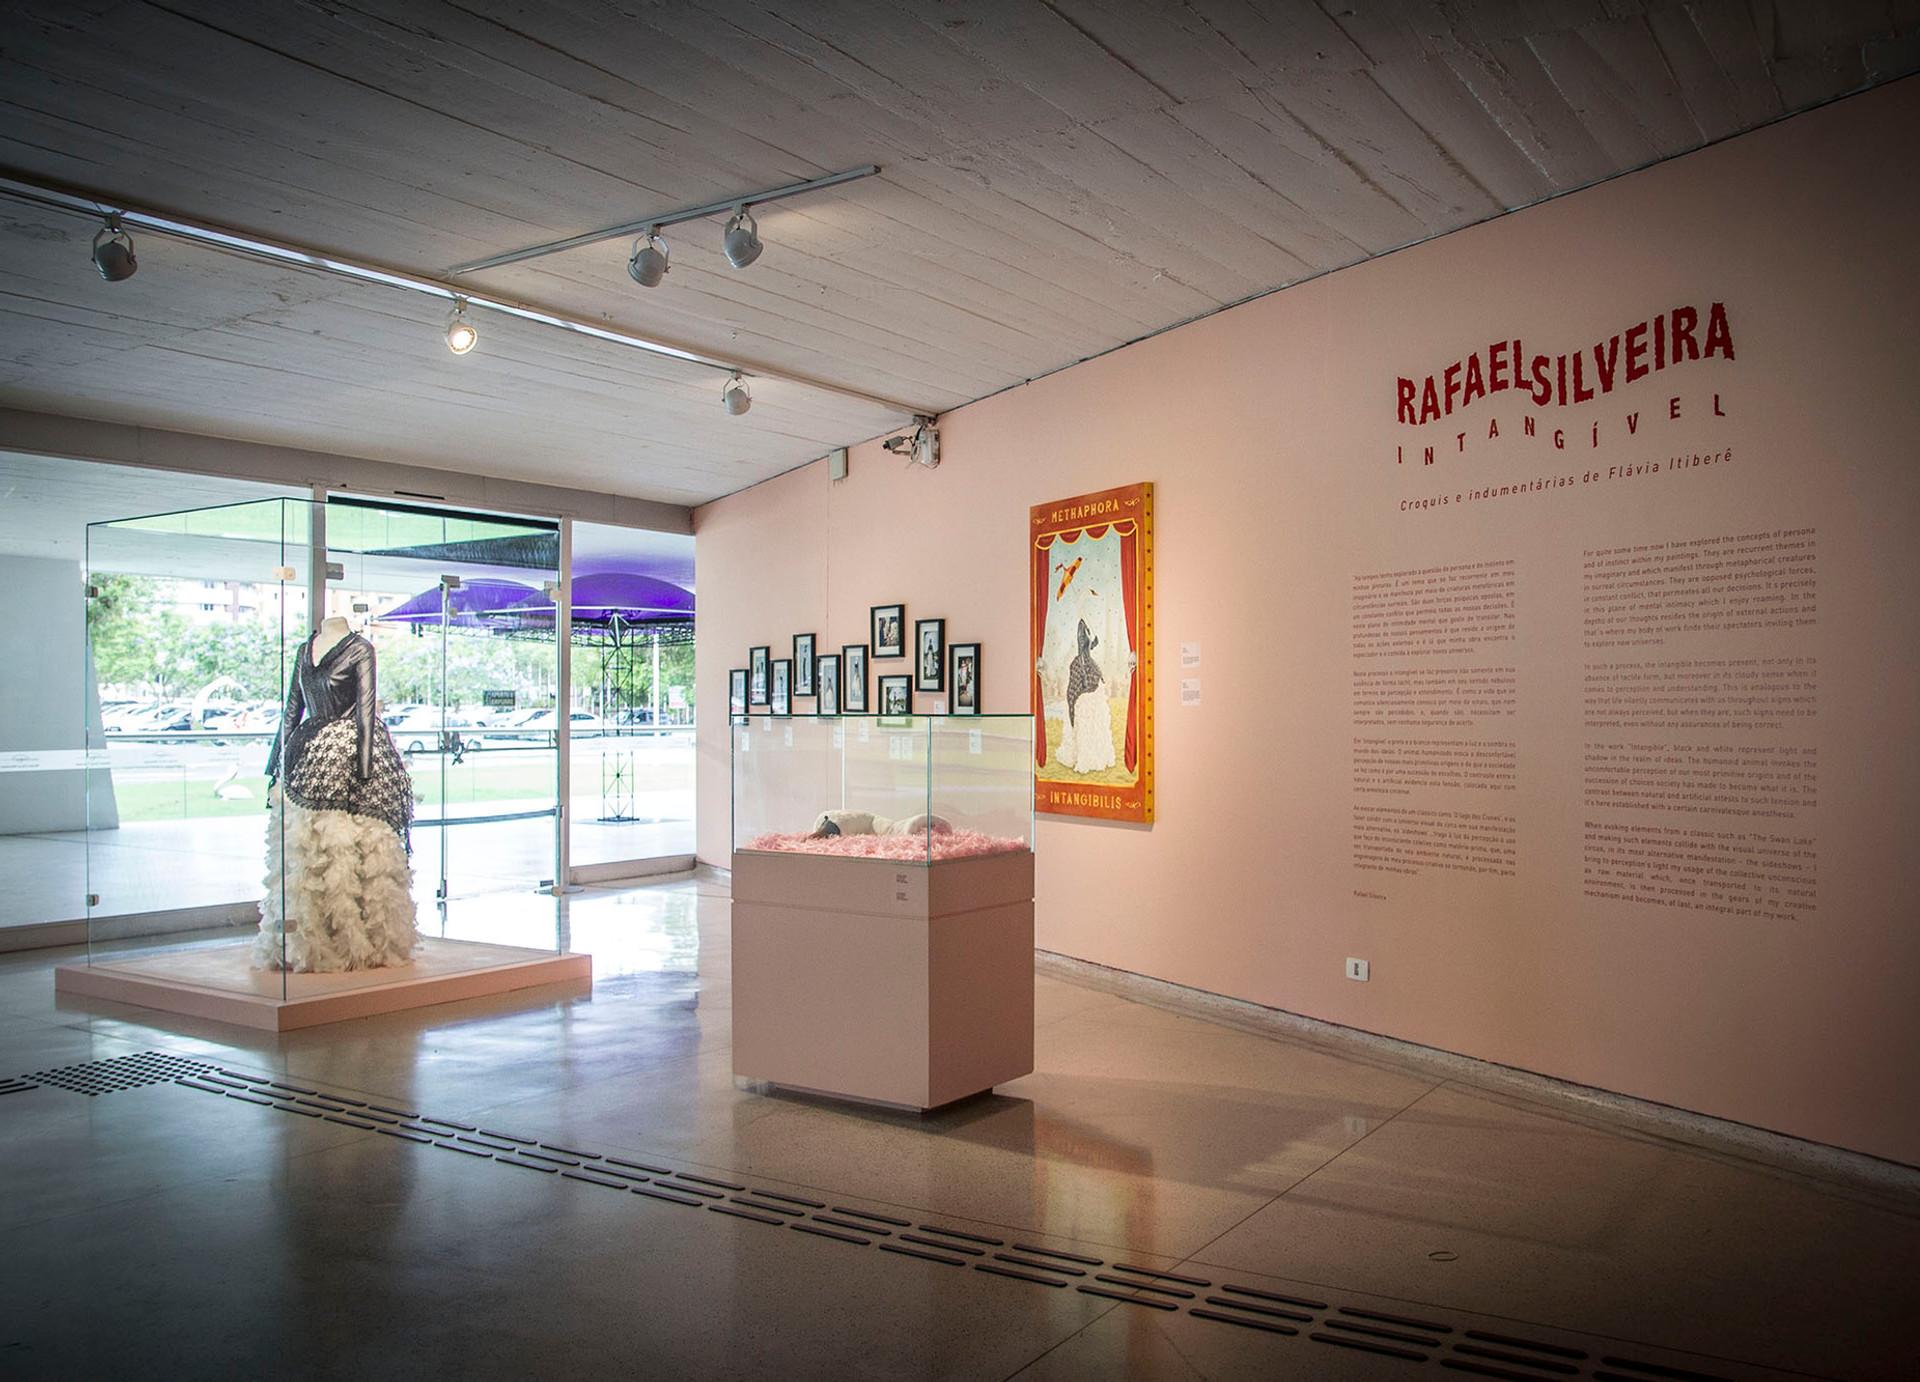 Intangível (detail of art installation at Oscar Niemeyer Museum)